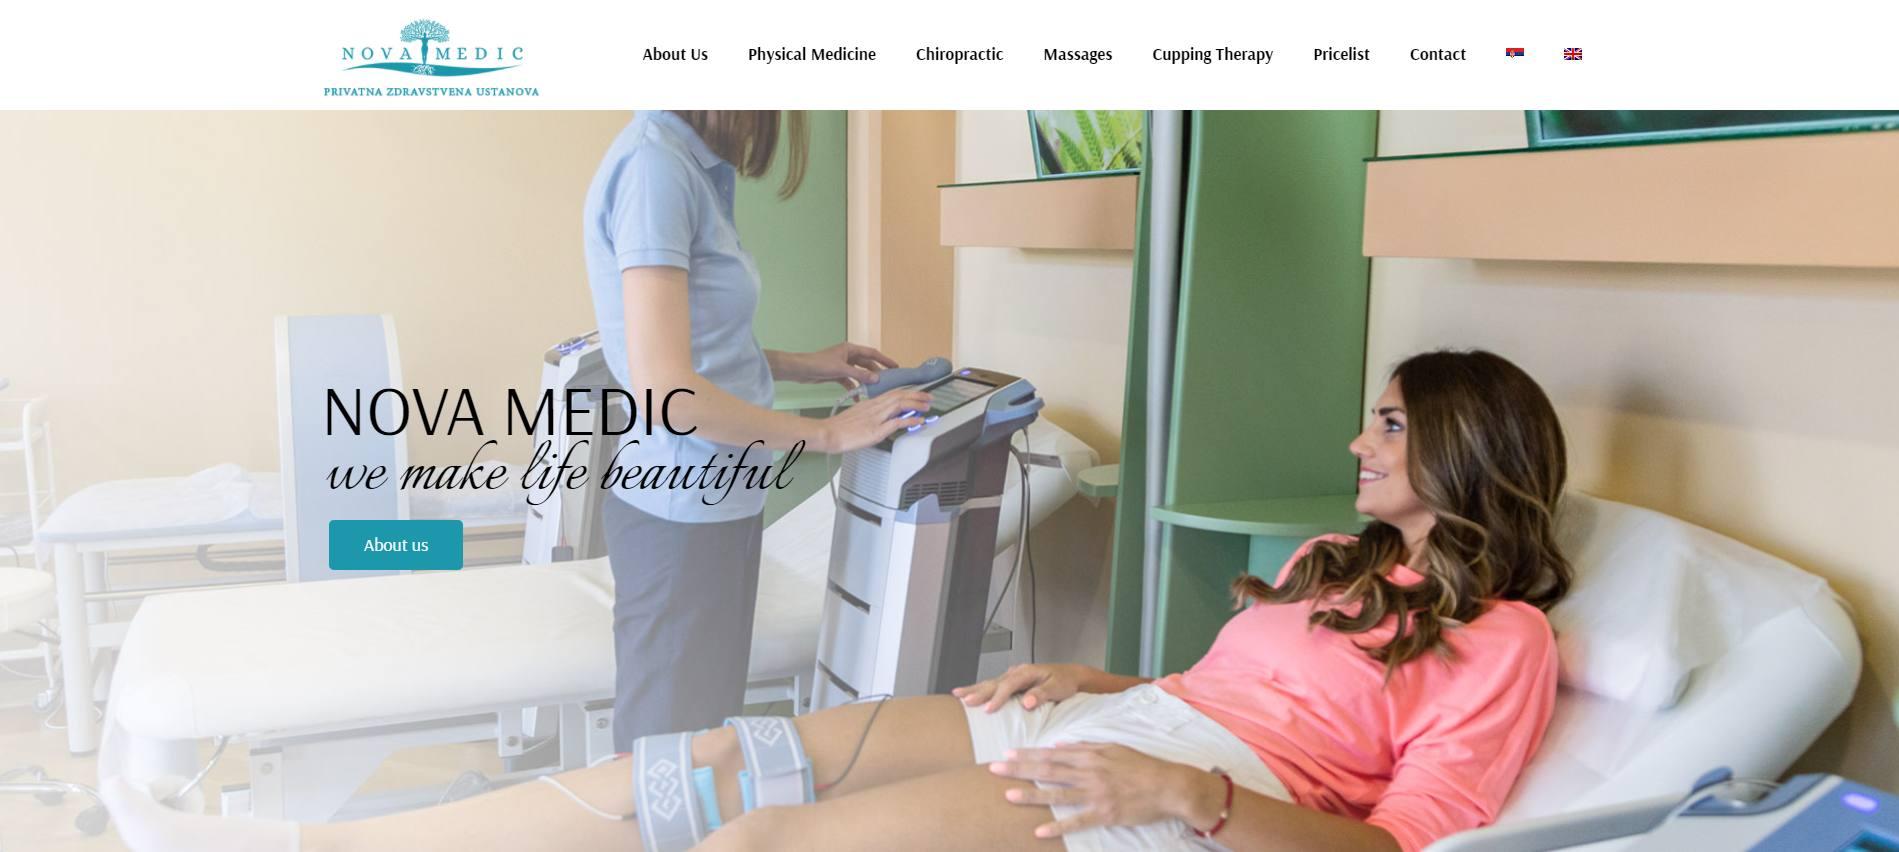 Novamedic web solution